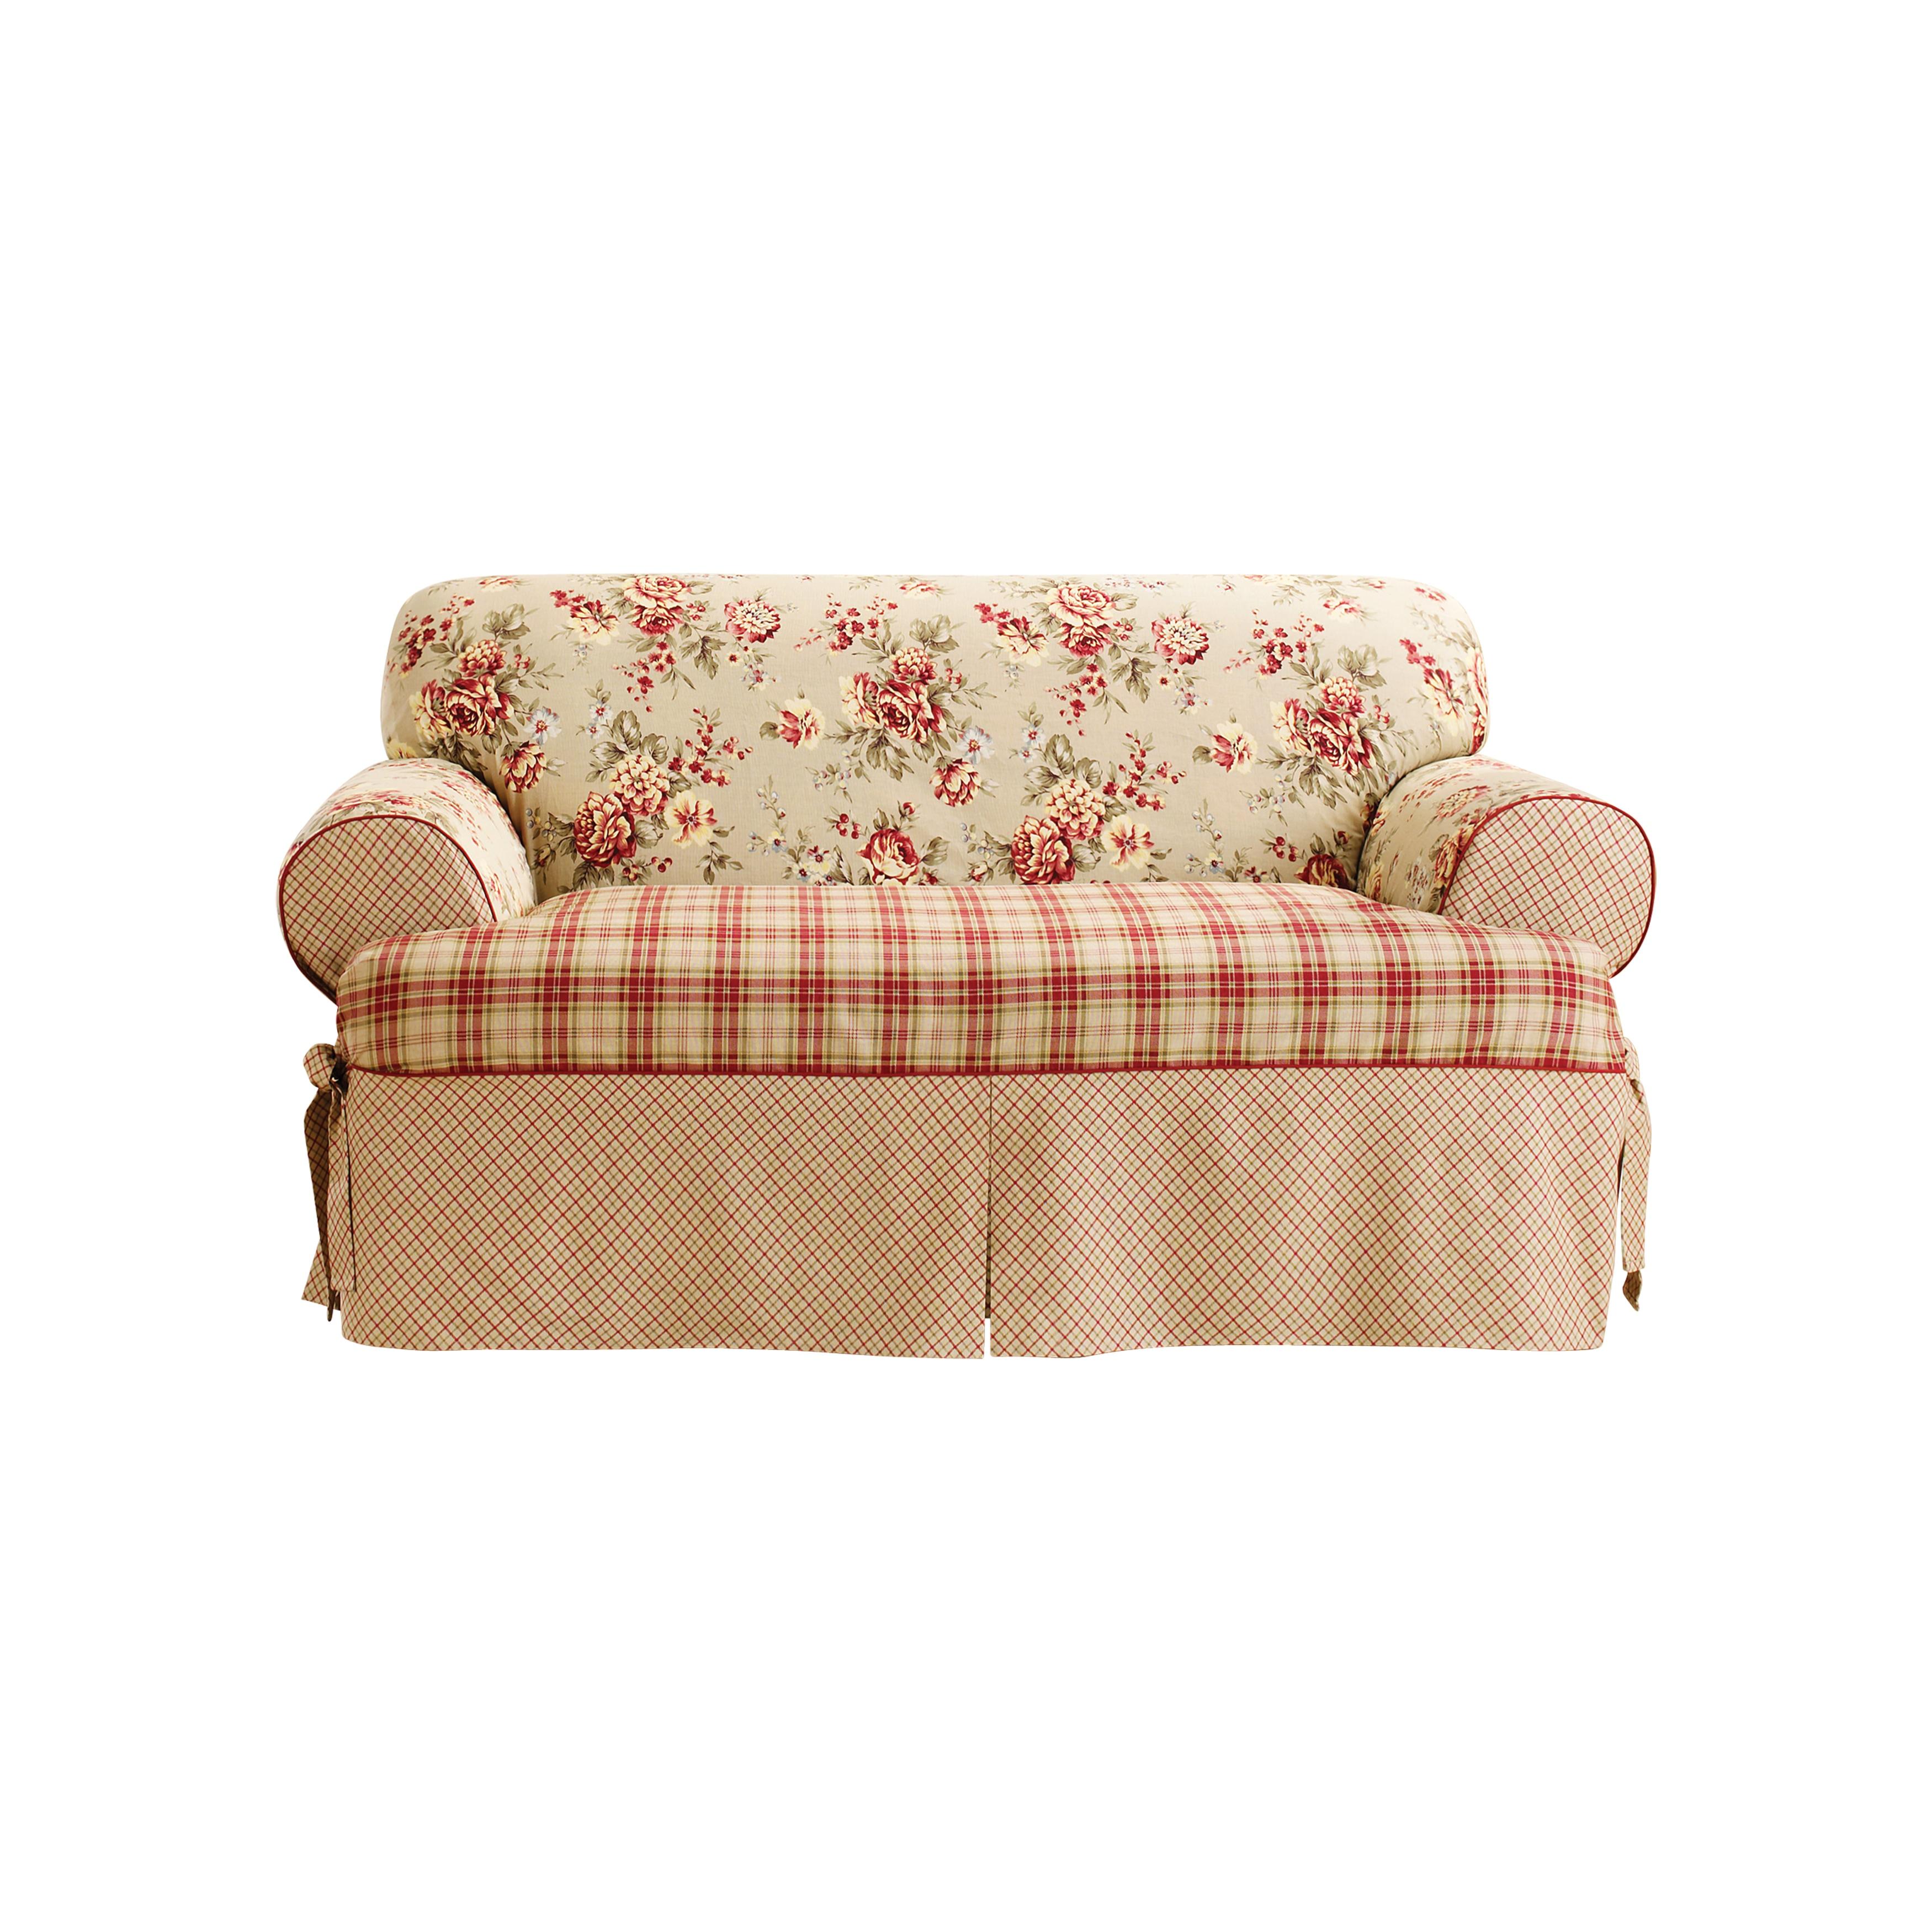 Sure Fit Lexington One-piece T-cushion Sofa Slipcover (Mu...